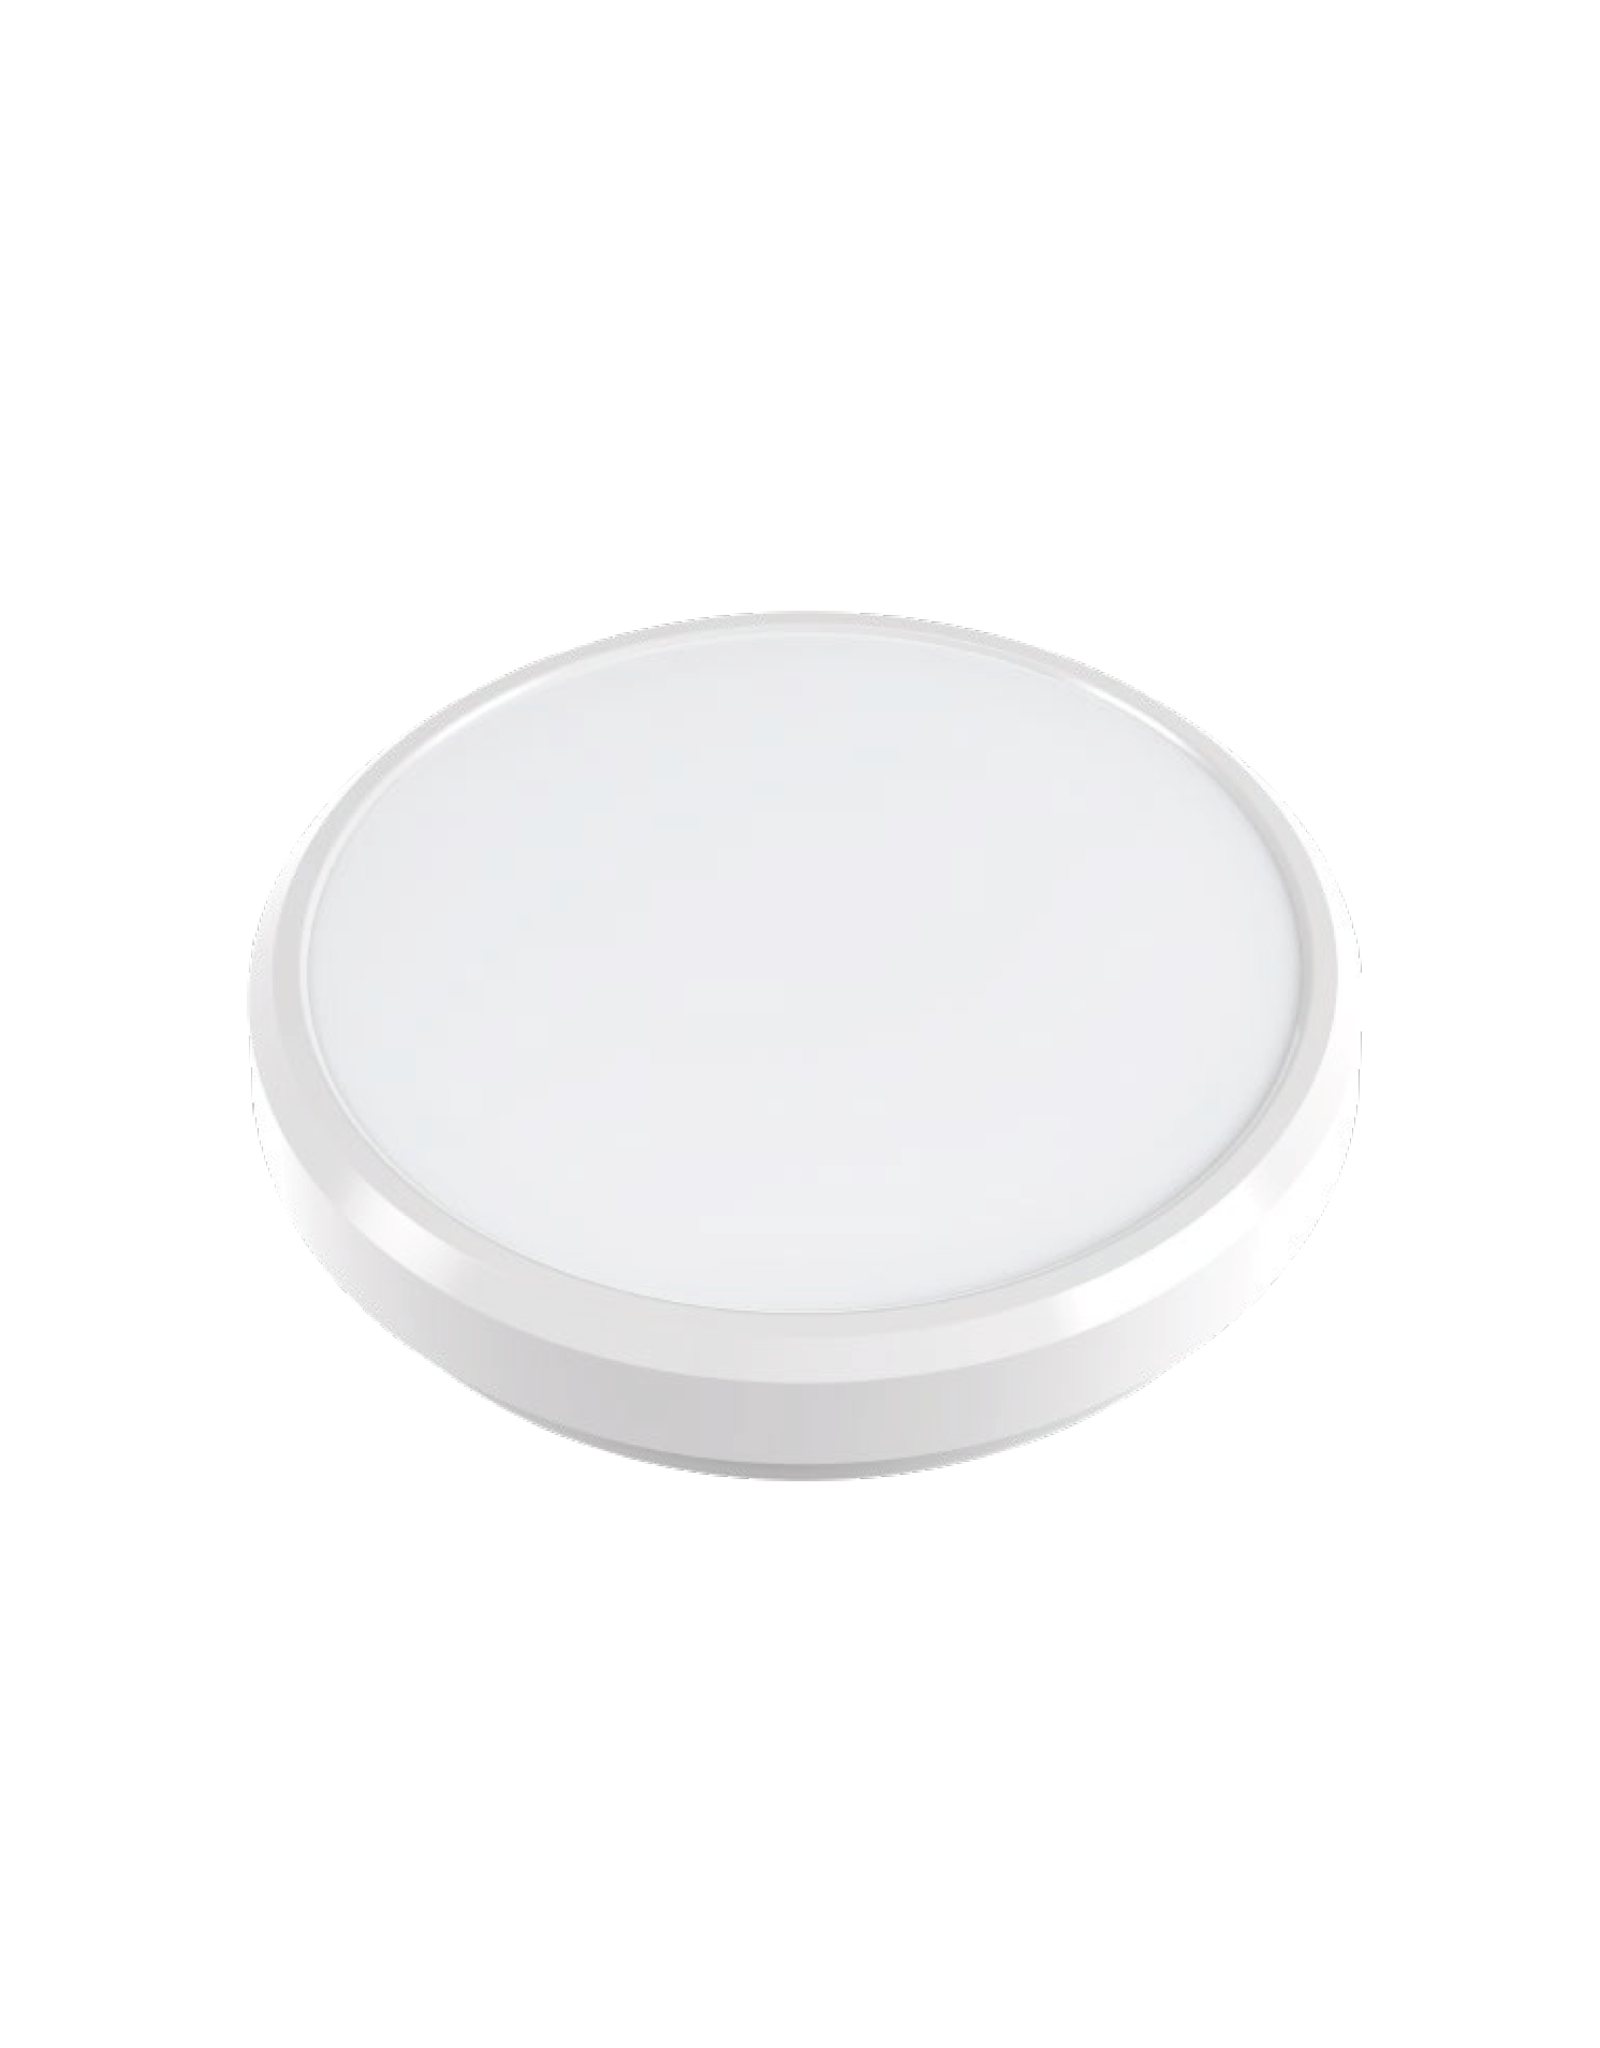 LED plafonniere LUNA 2.0 - 3000k/4000k/5000k - 14W/18W - NOOD